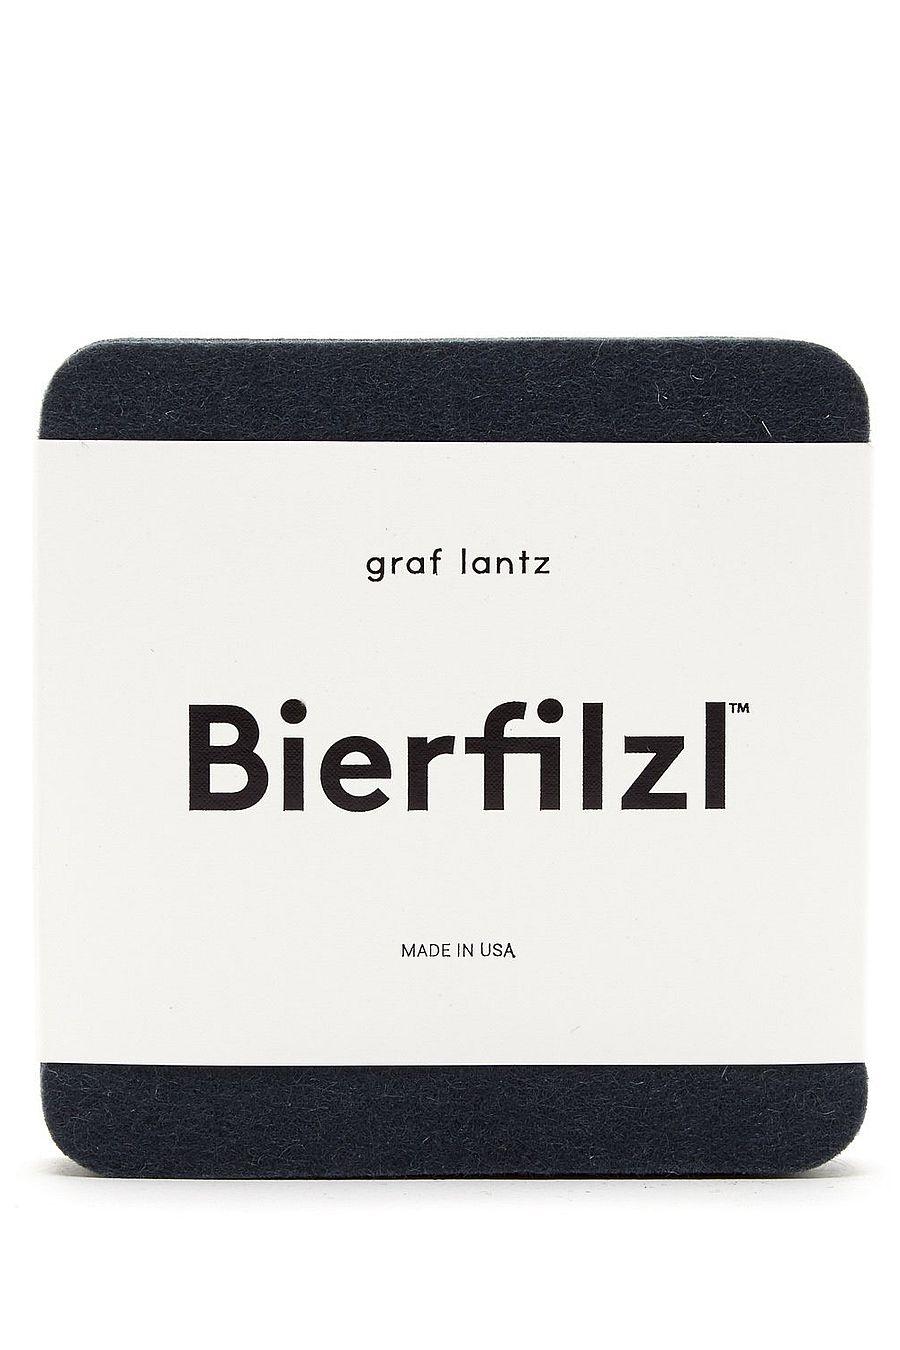 Graf Lantz Bierfilzl Square Felt Coaster - Alpine